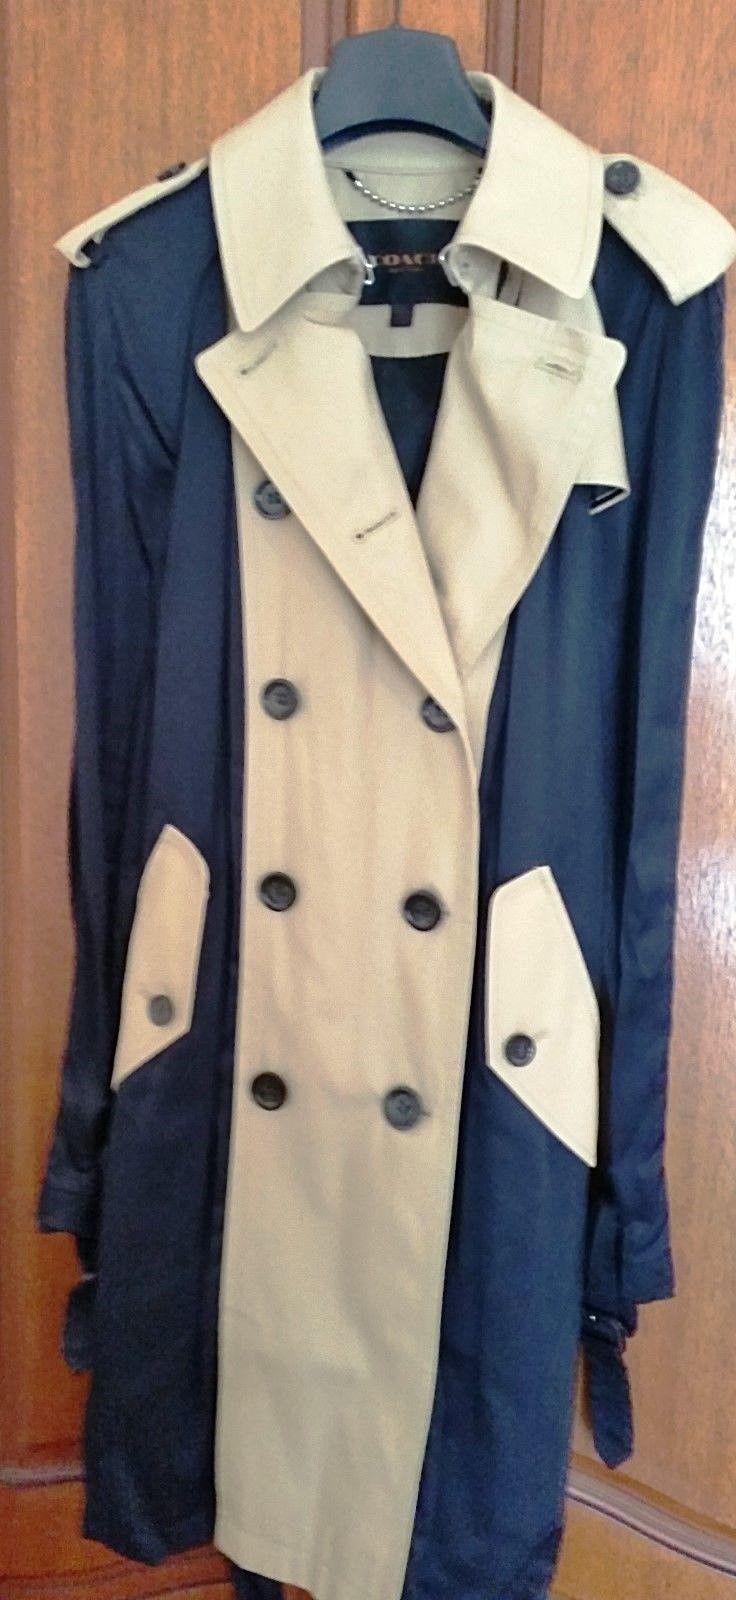 Coach black satine and beige cotton ladies trench coat